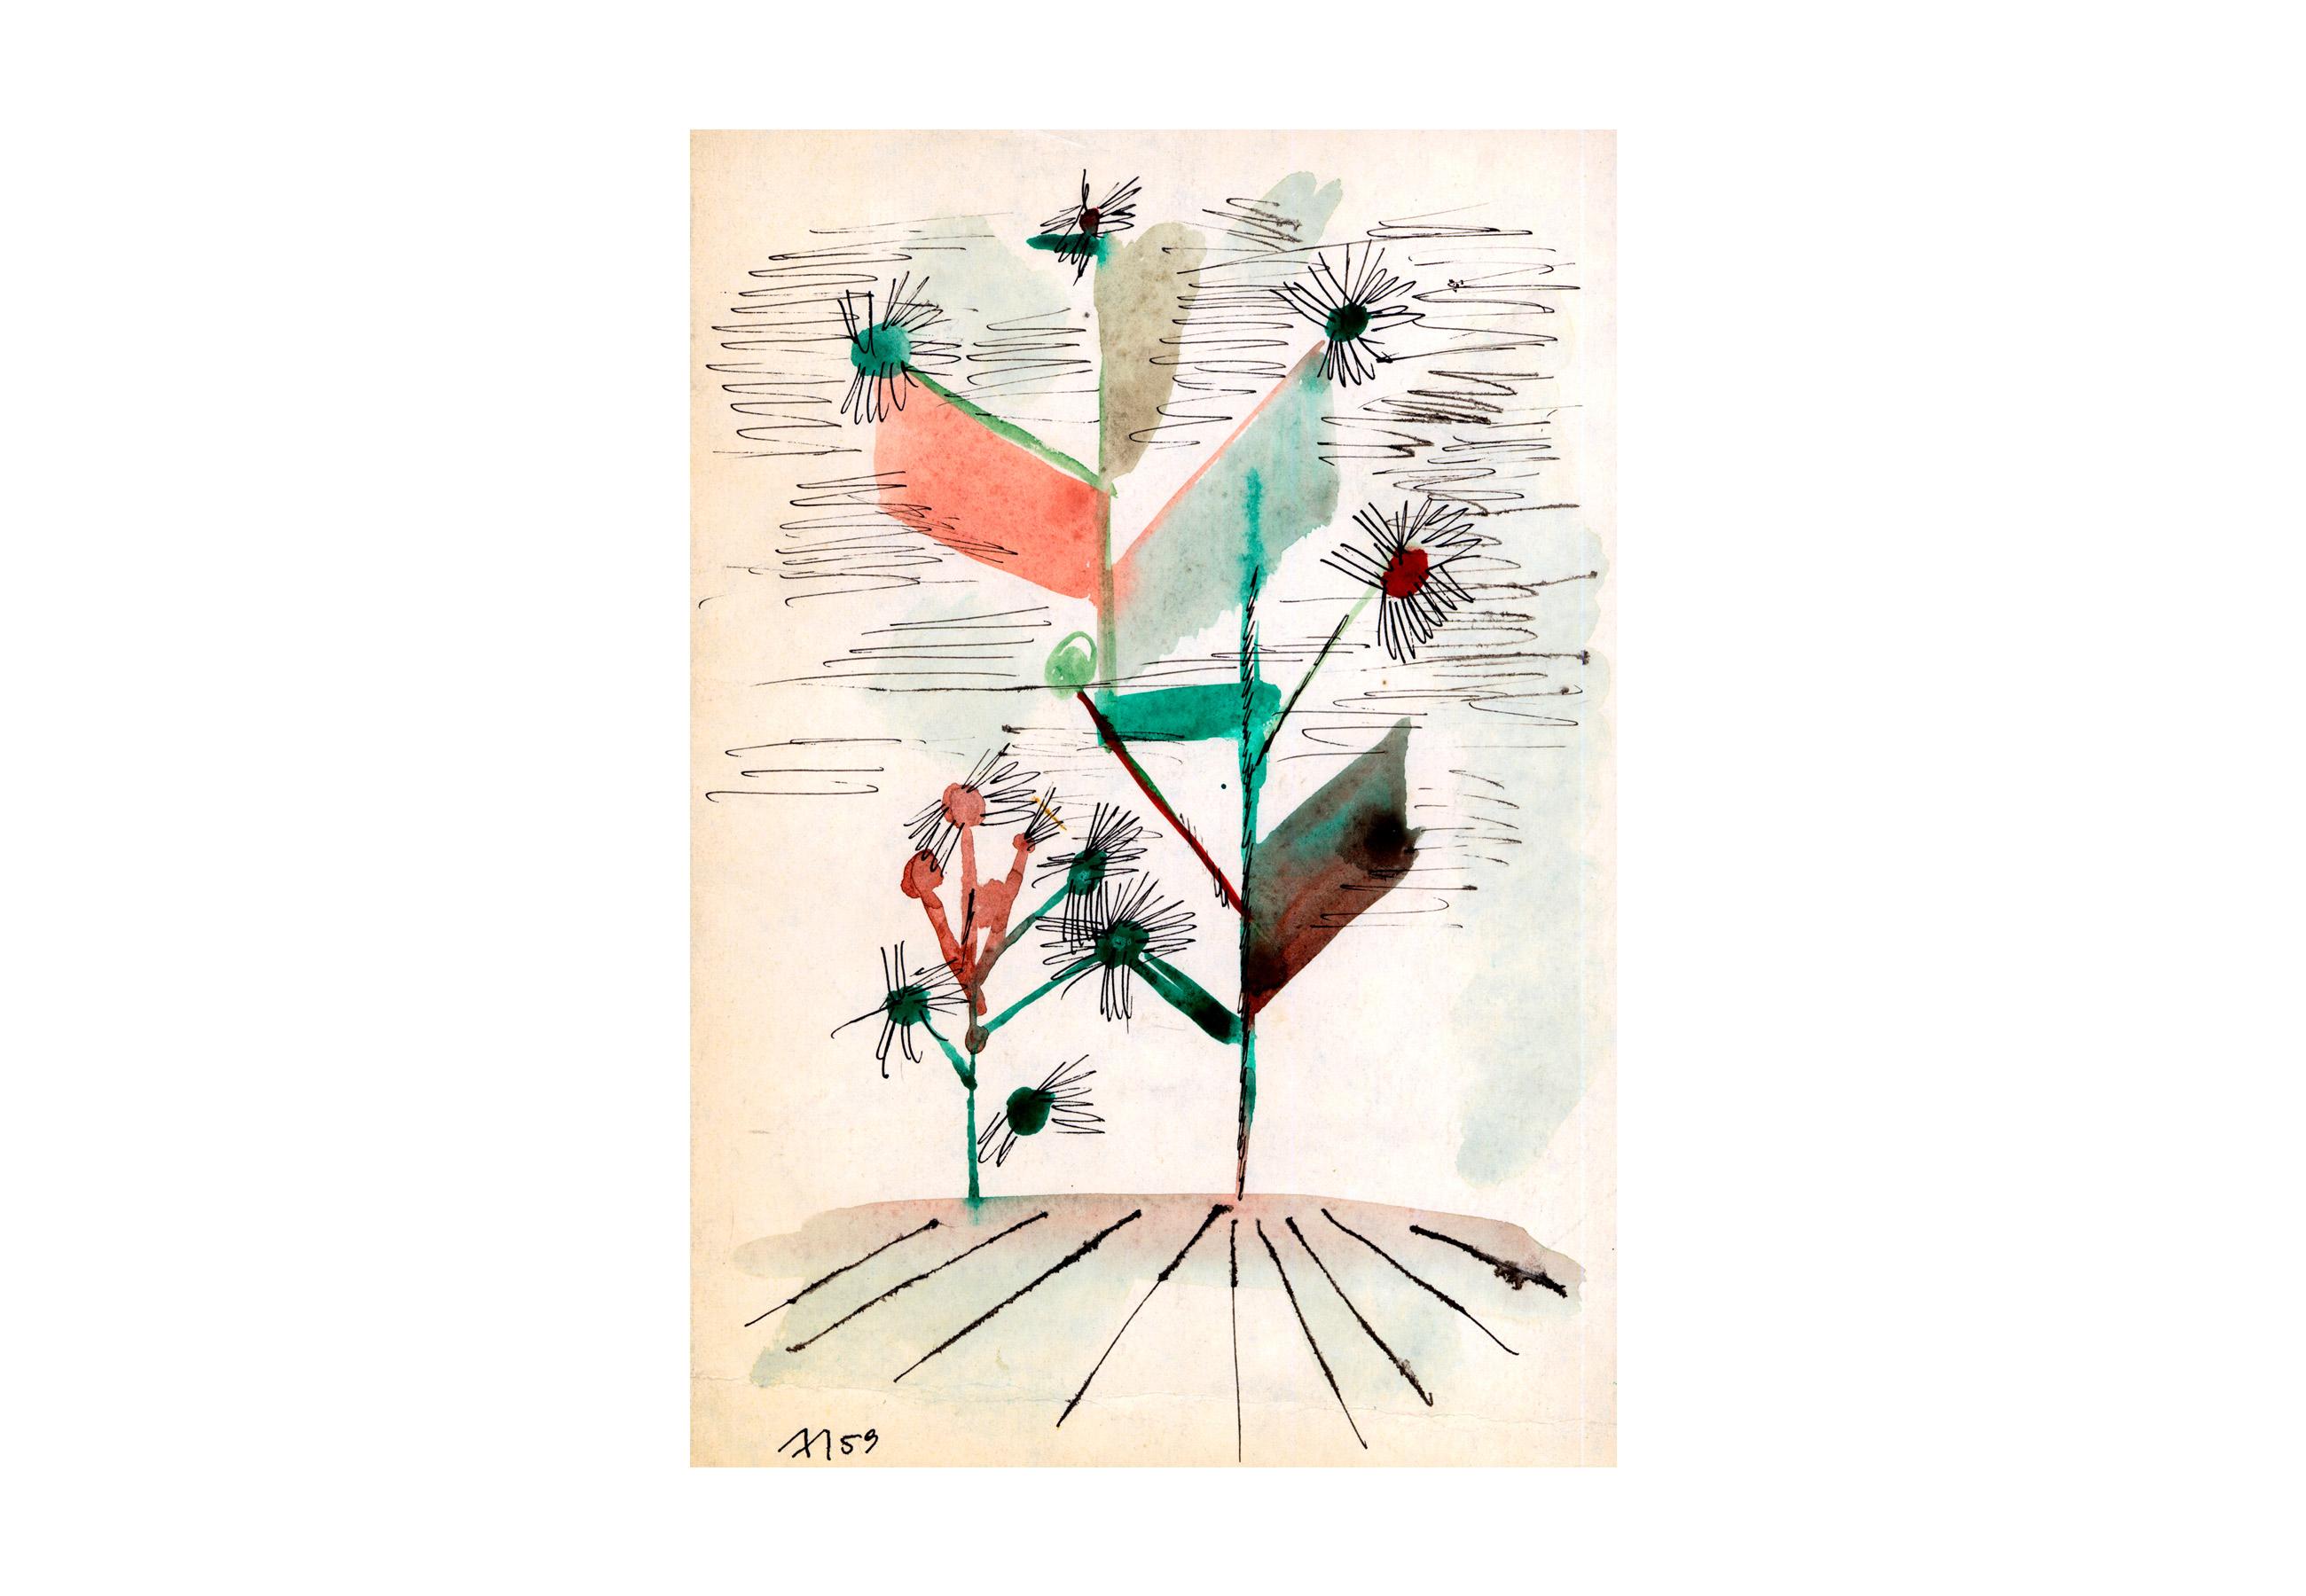 Lamm-Portfolio-1956-59-33.jpg